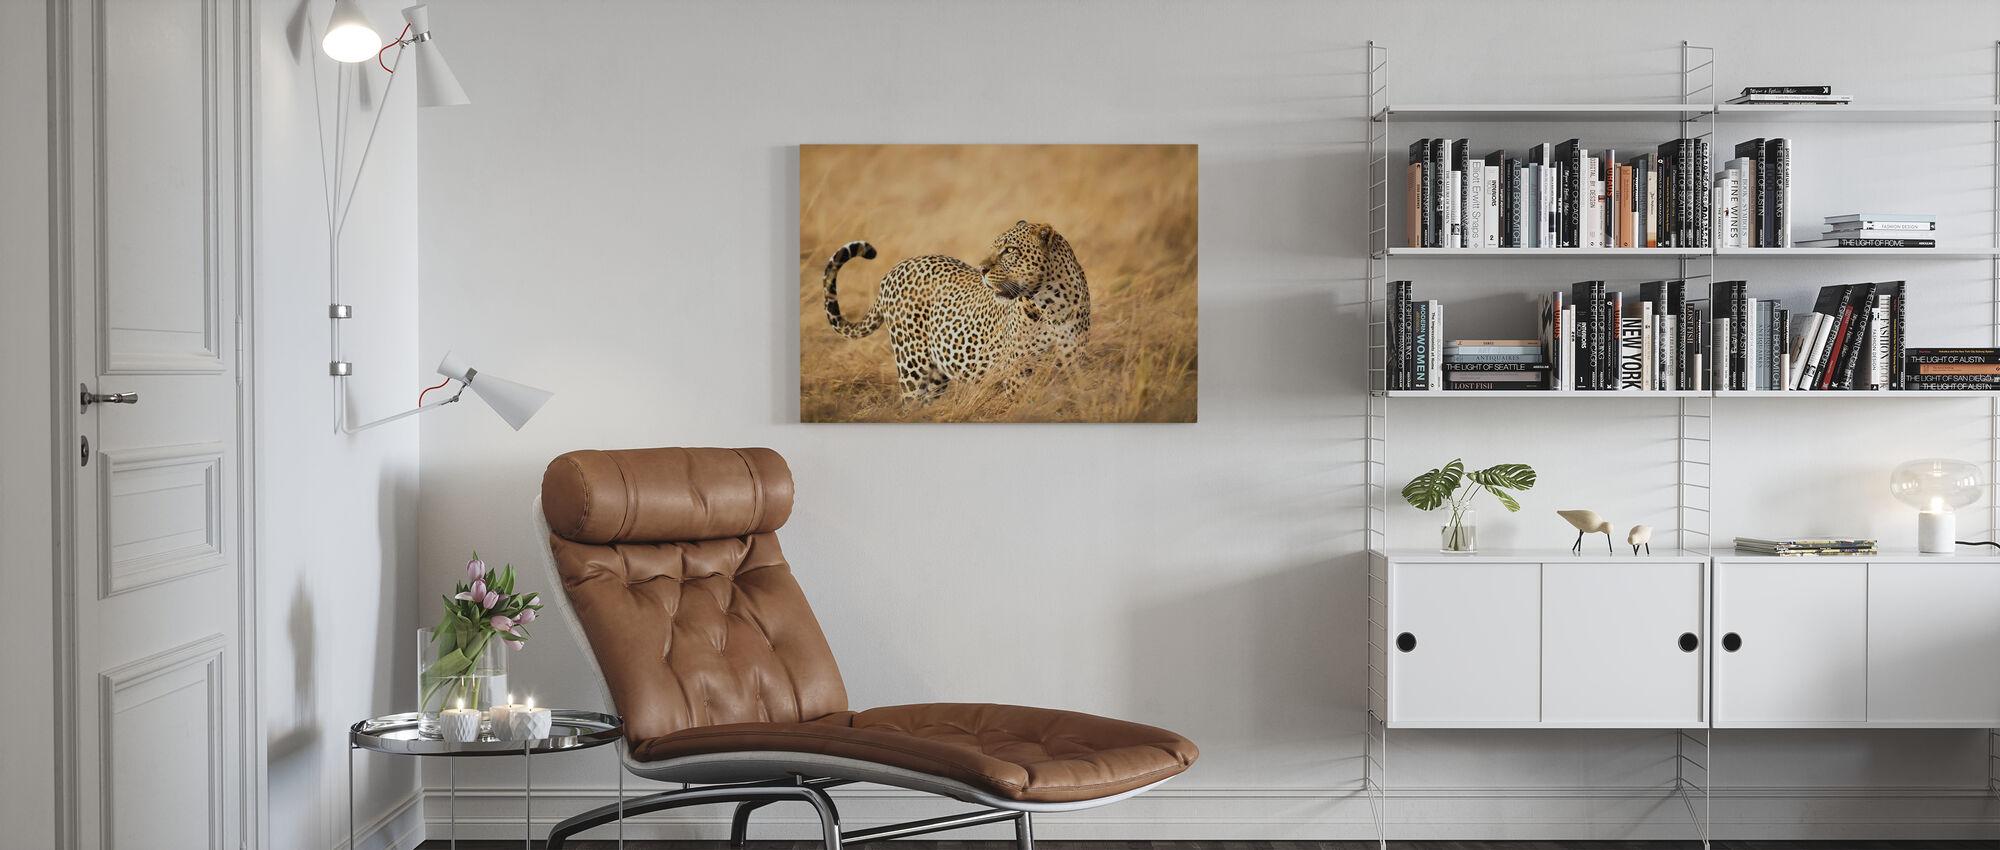 Kijken - Canvas print - Woonkamer